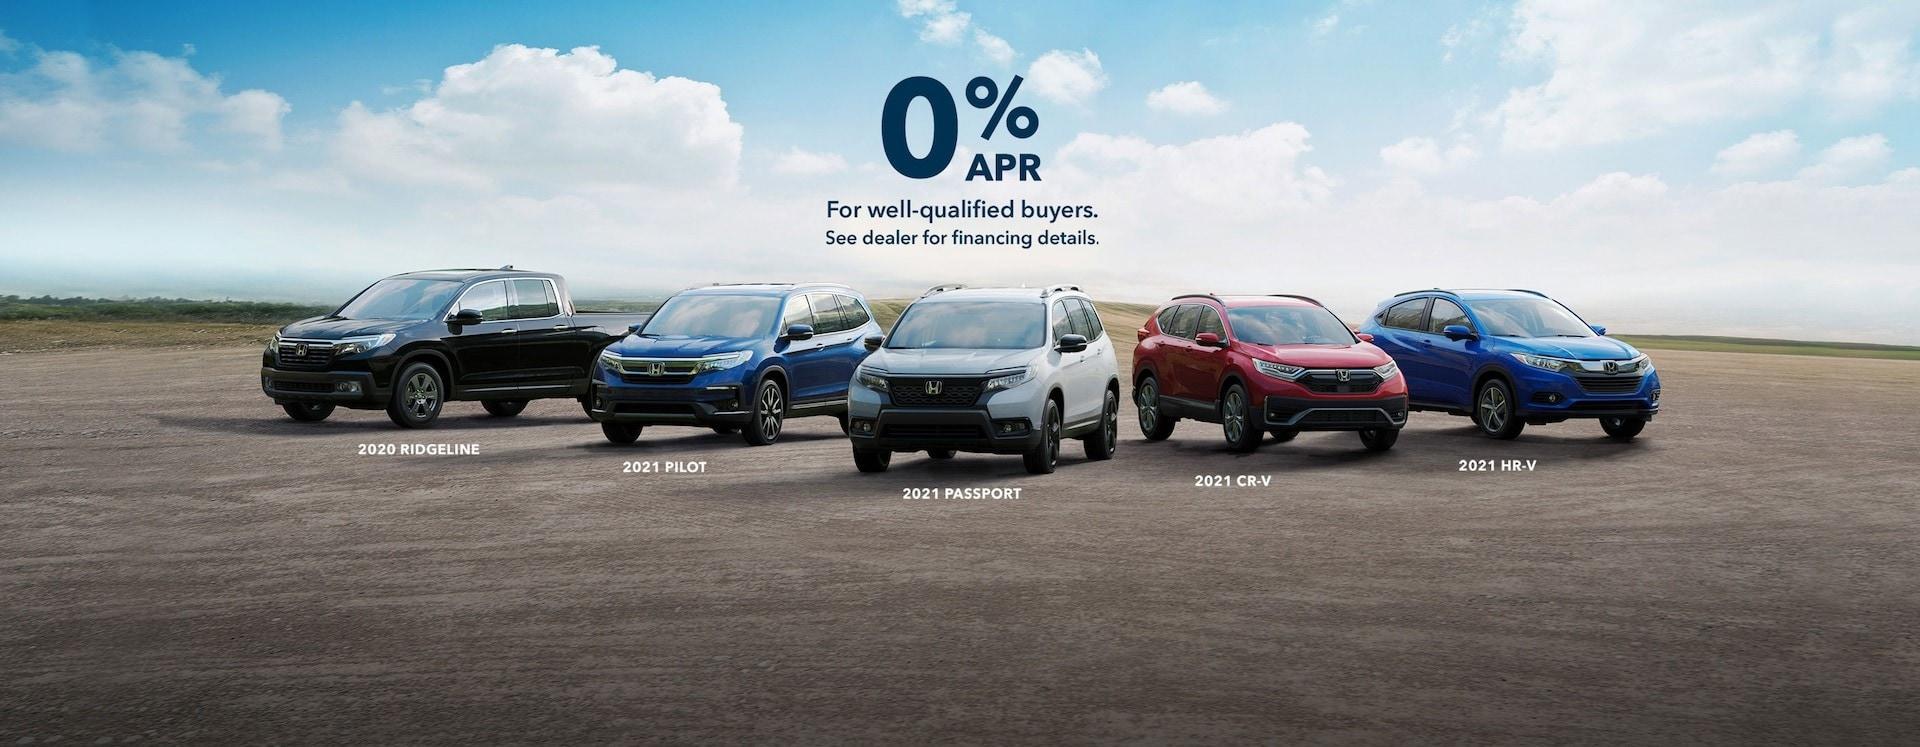 0% Financing at Roper Honda